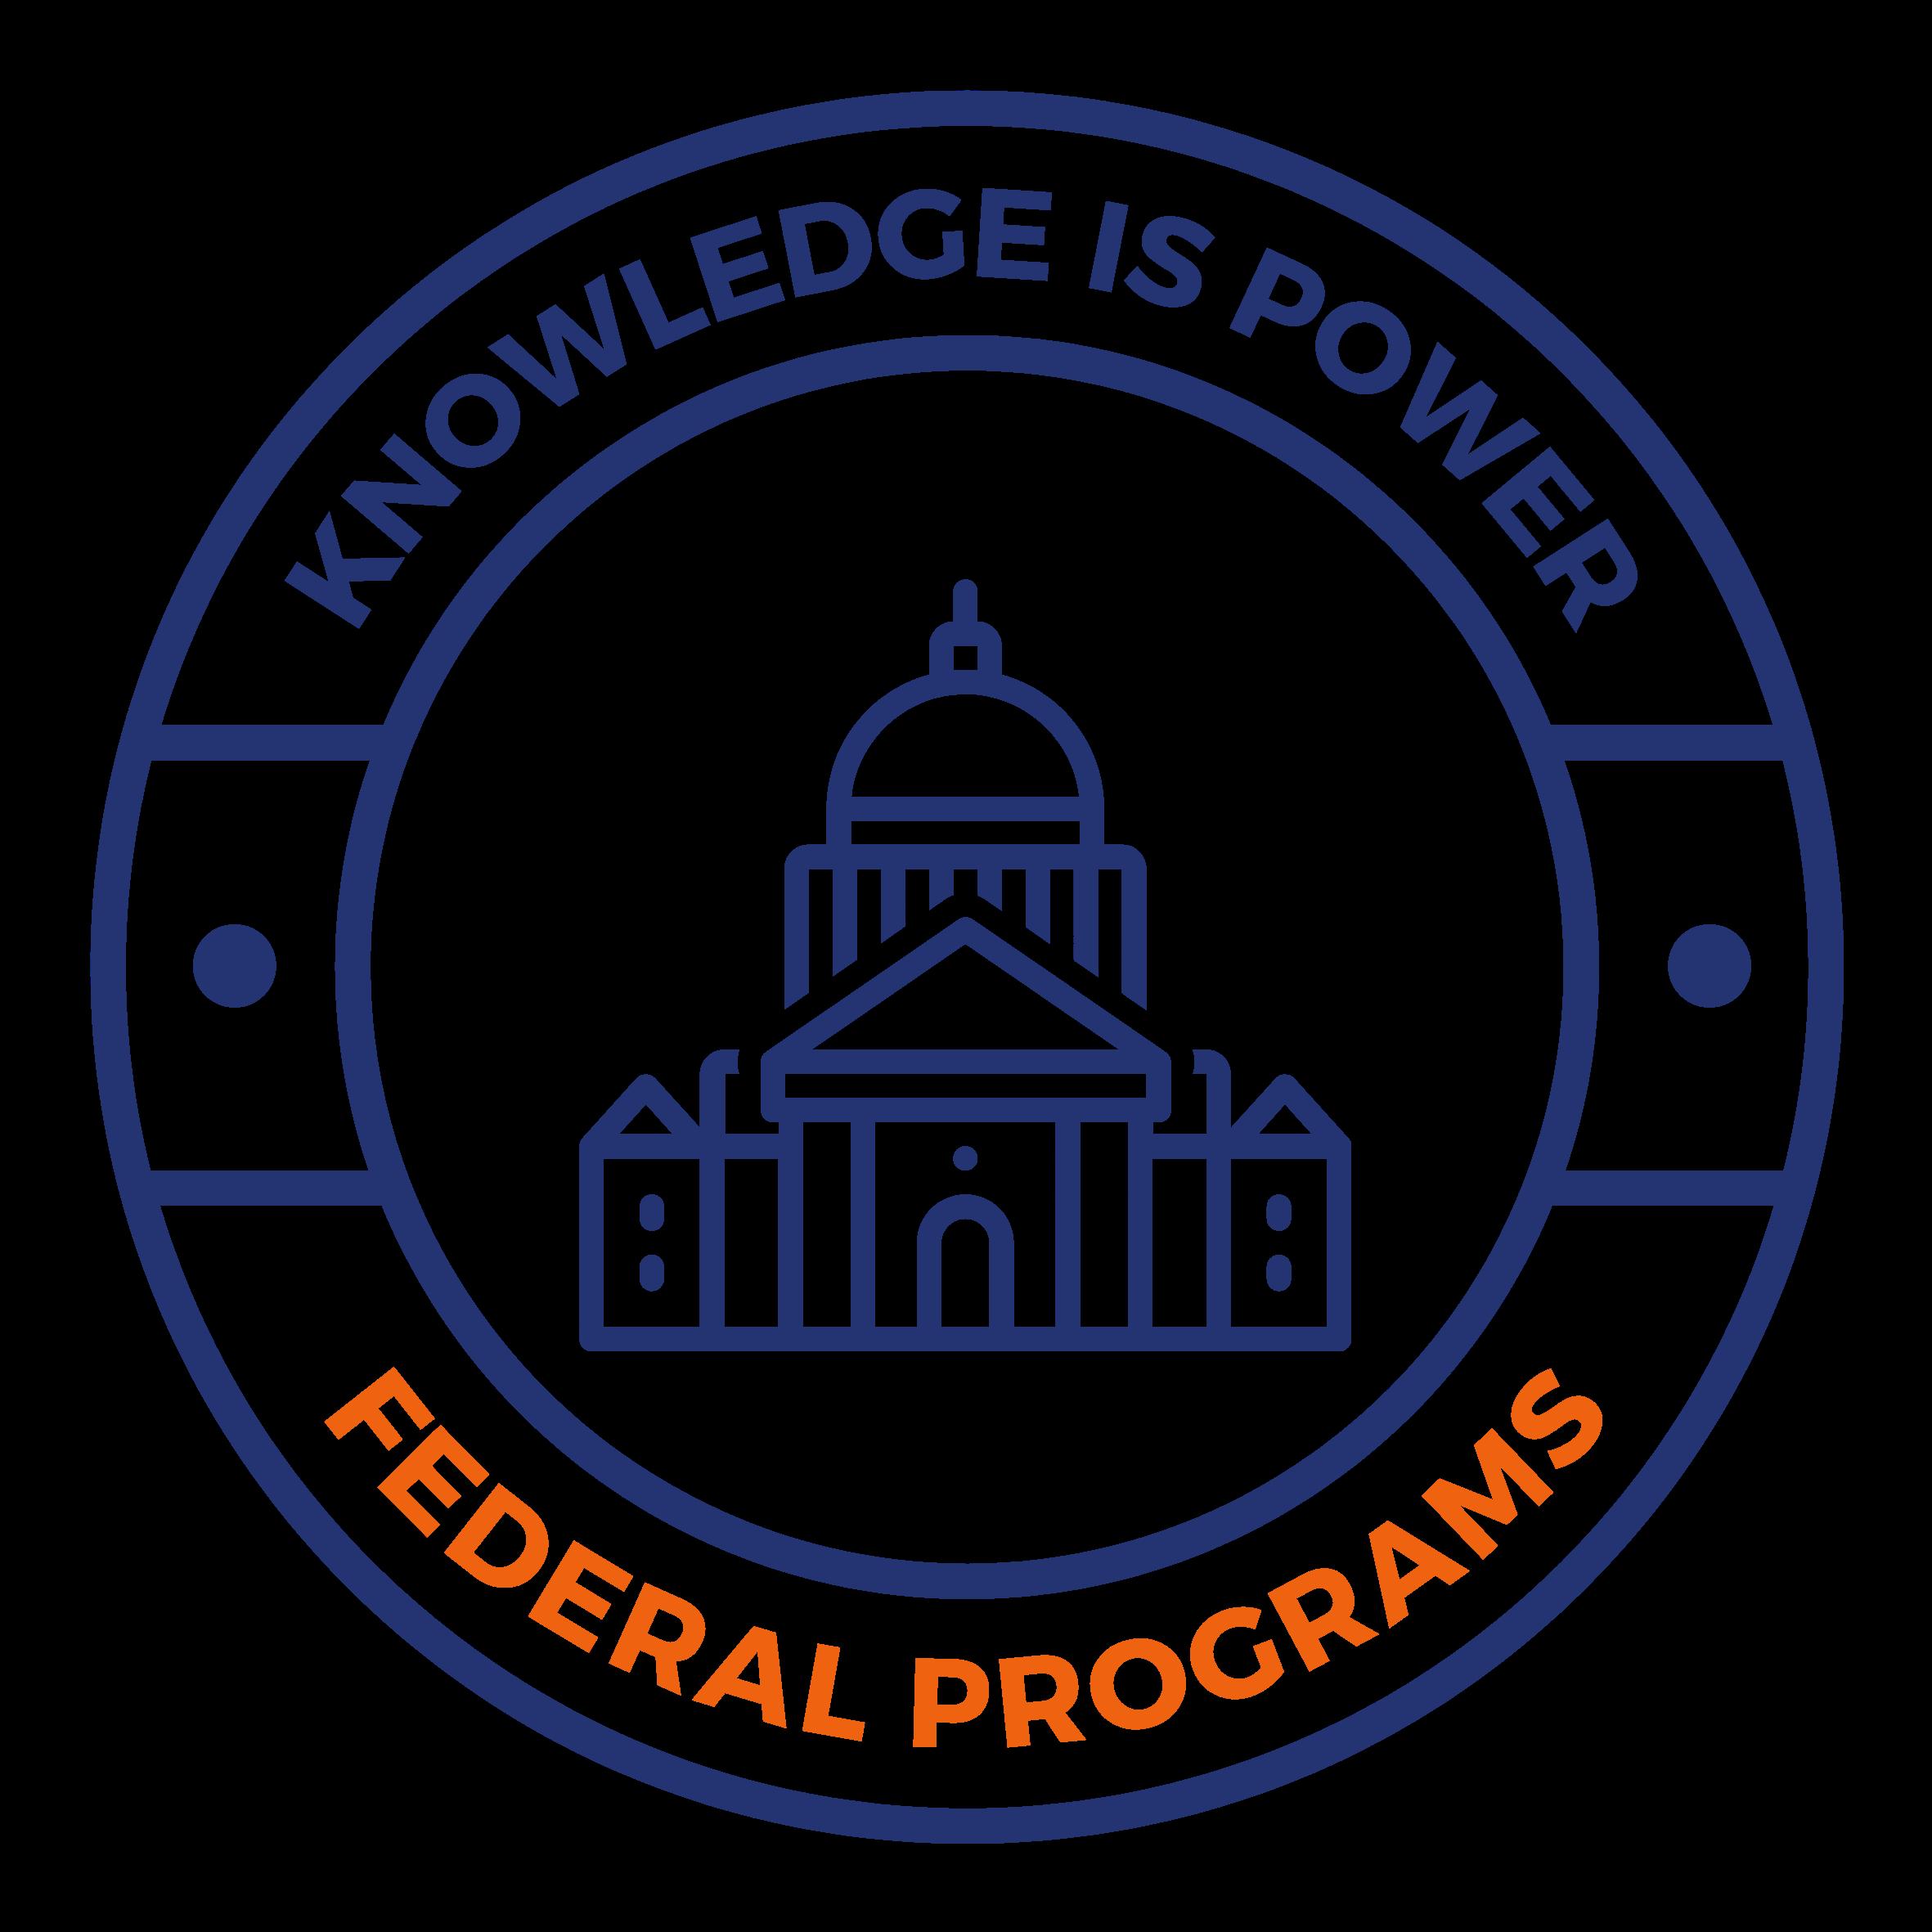 FederalPrograms